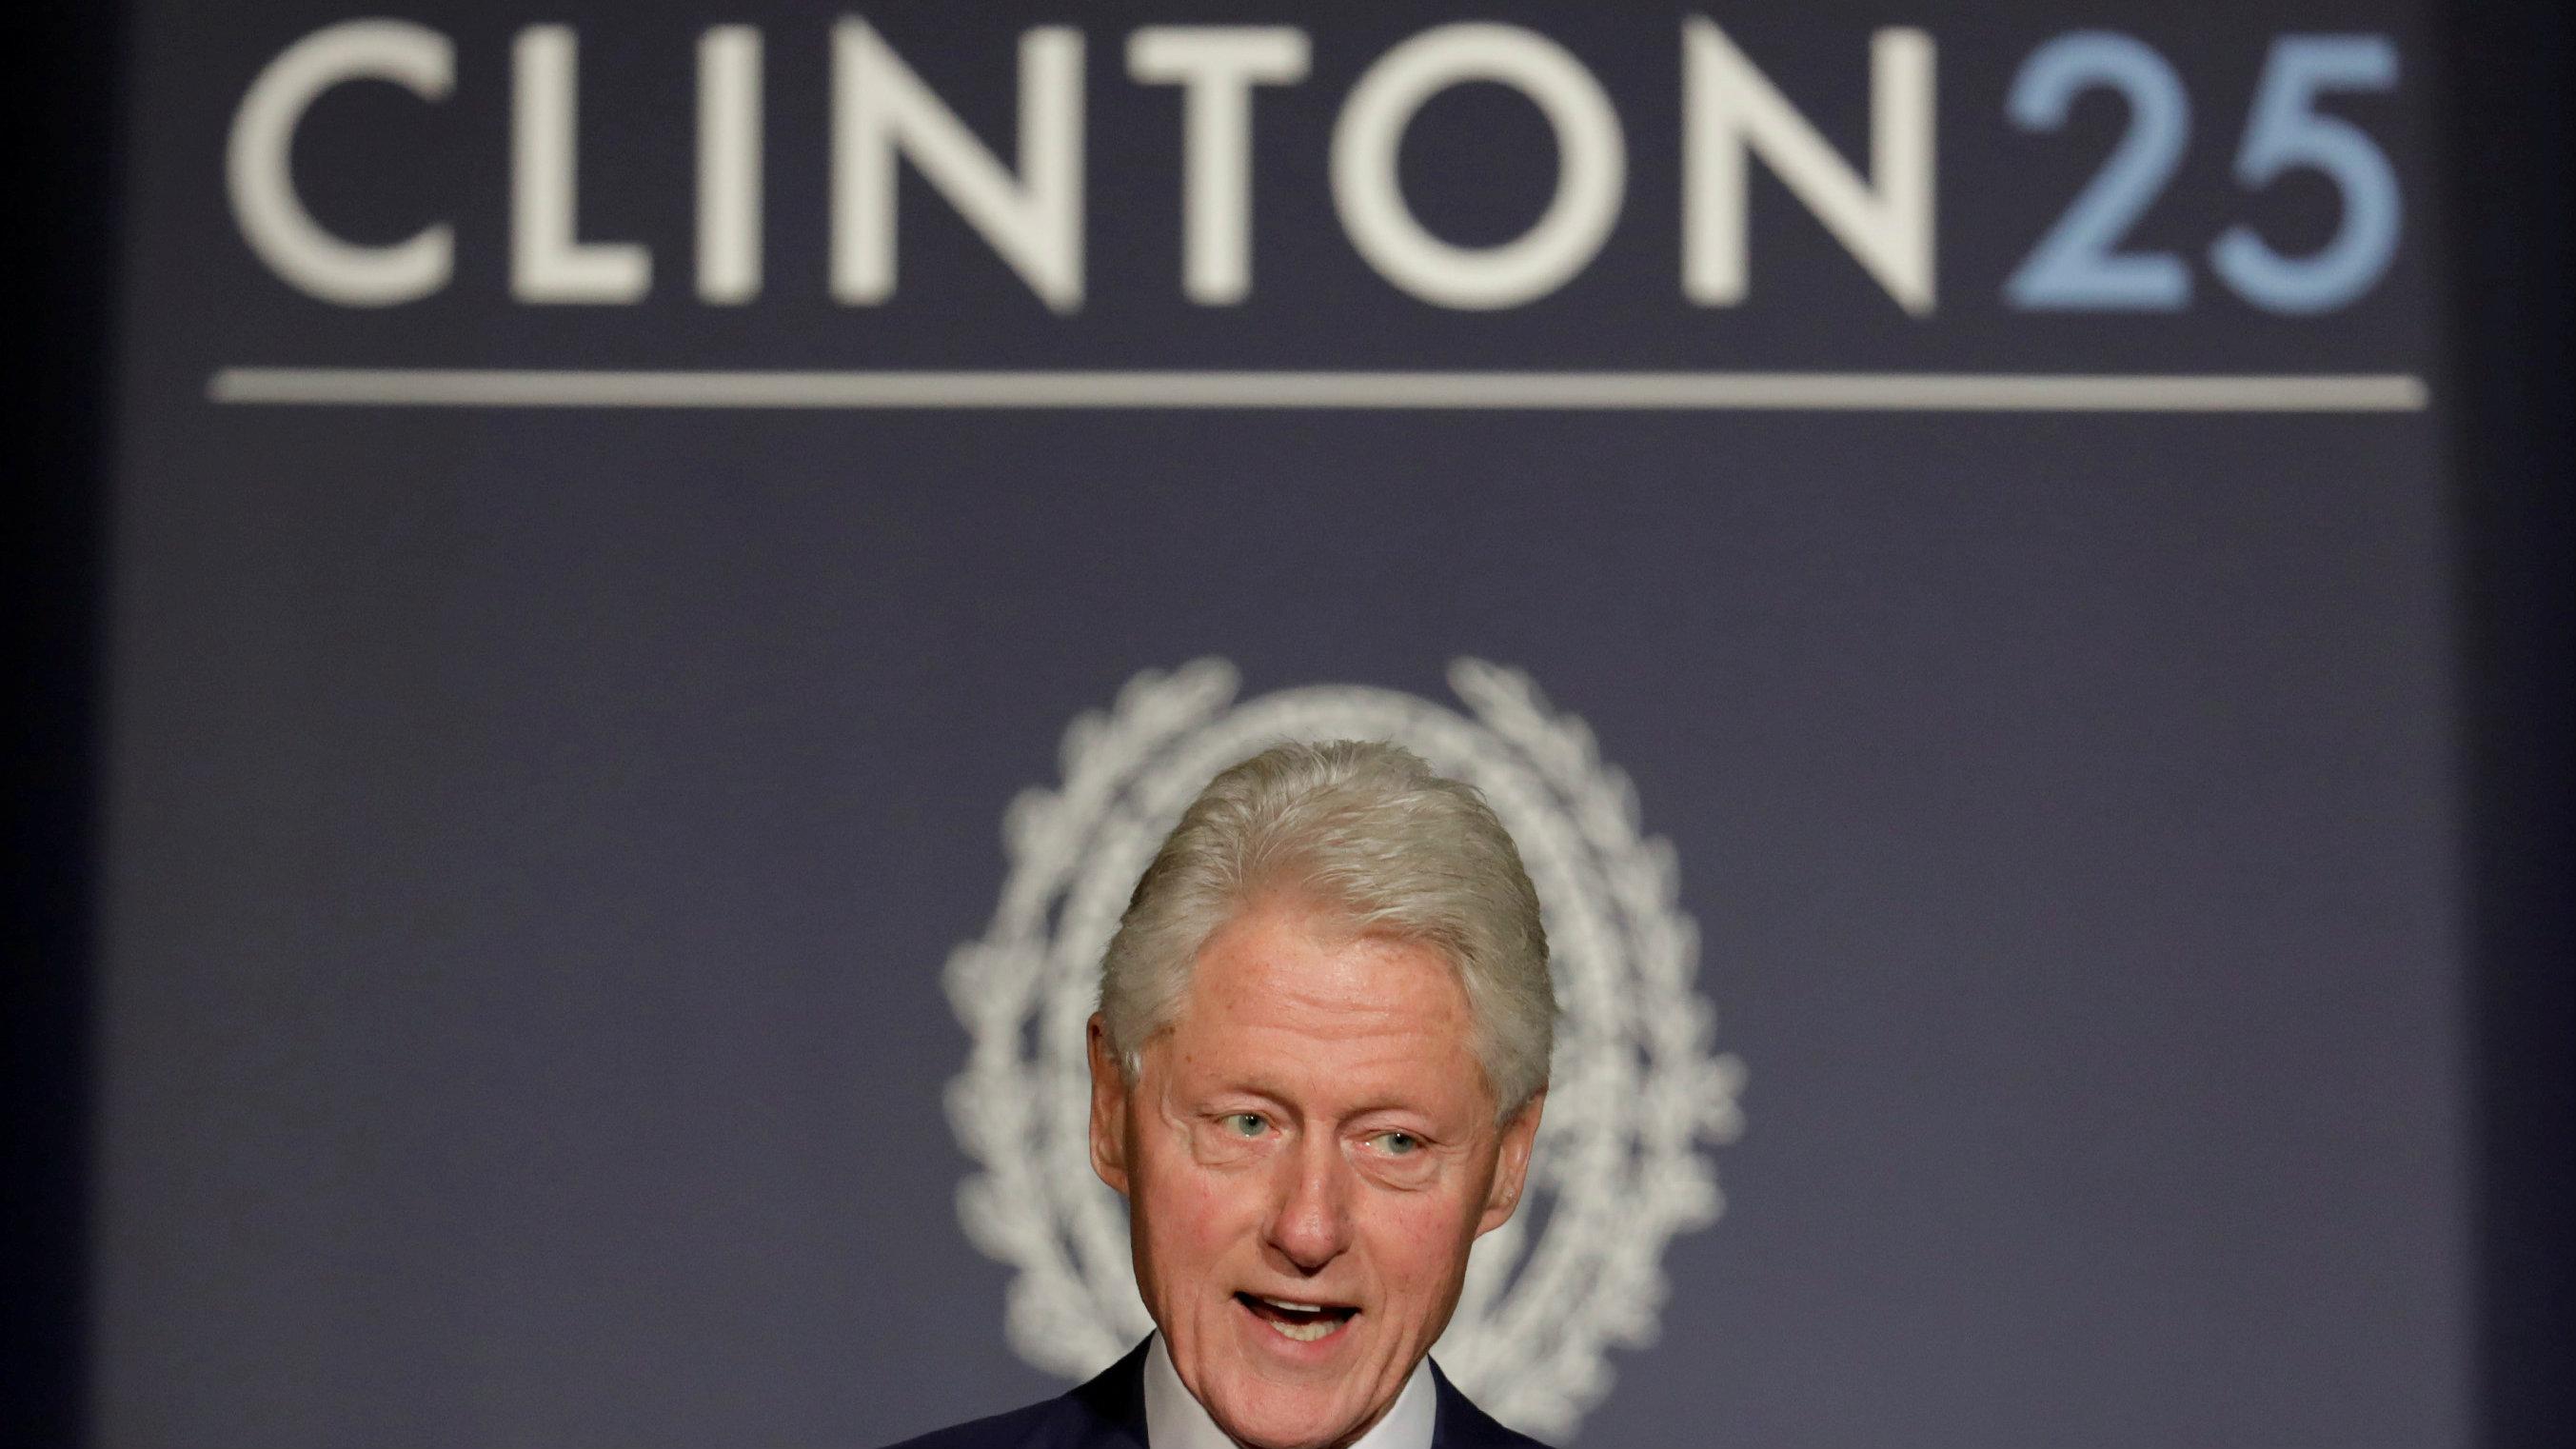 Bill Clintons Declining Legacy Monica Lewinsky Impeachment